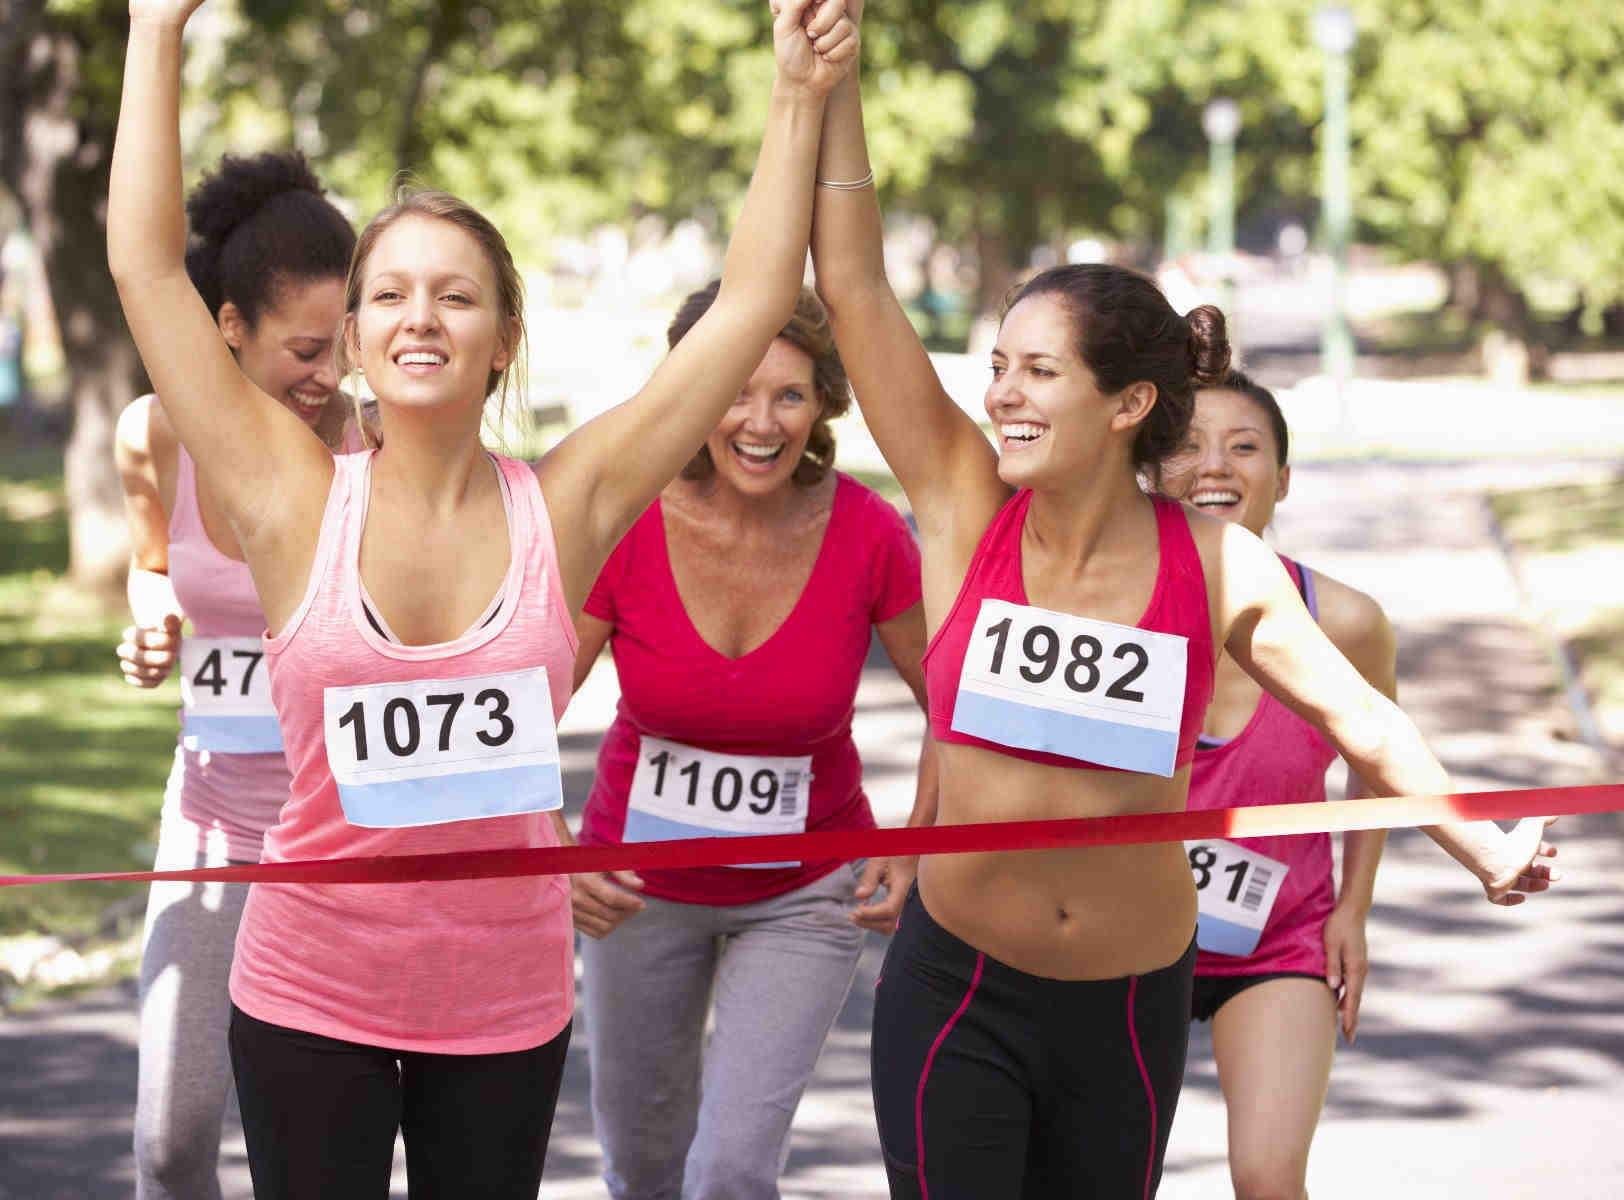 ladies taking part in a charity fun run